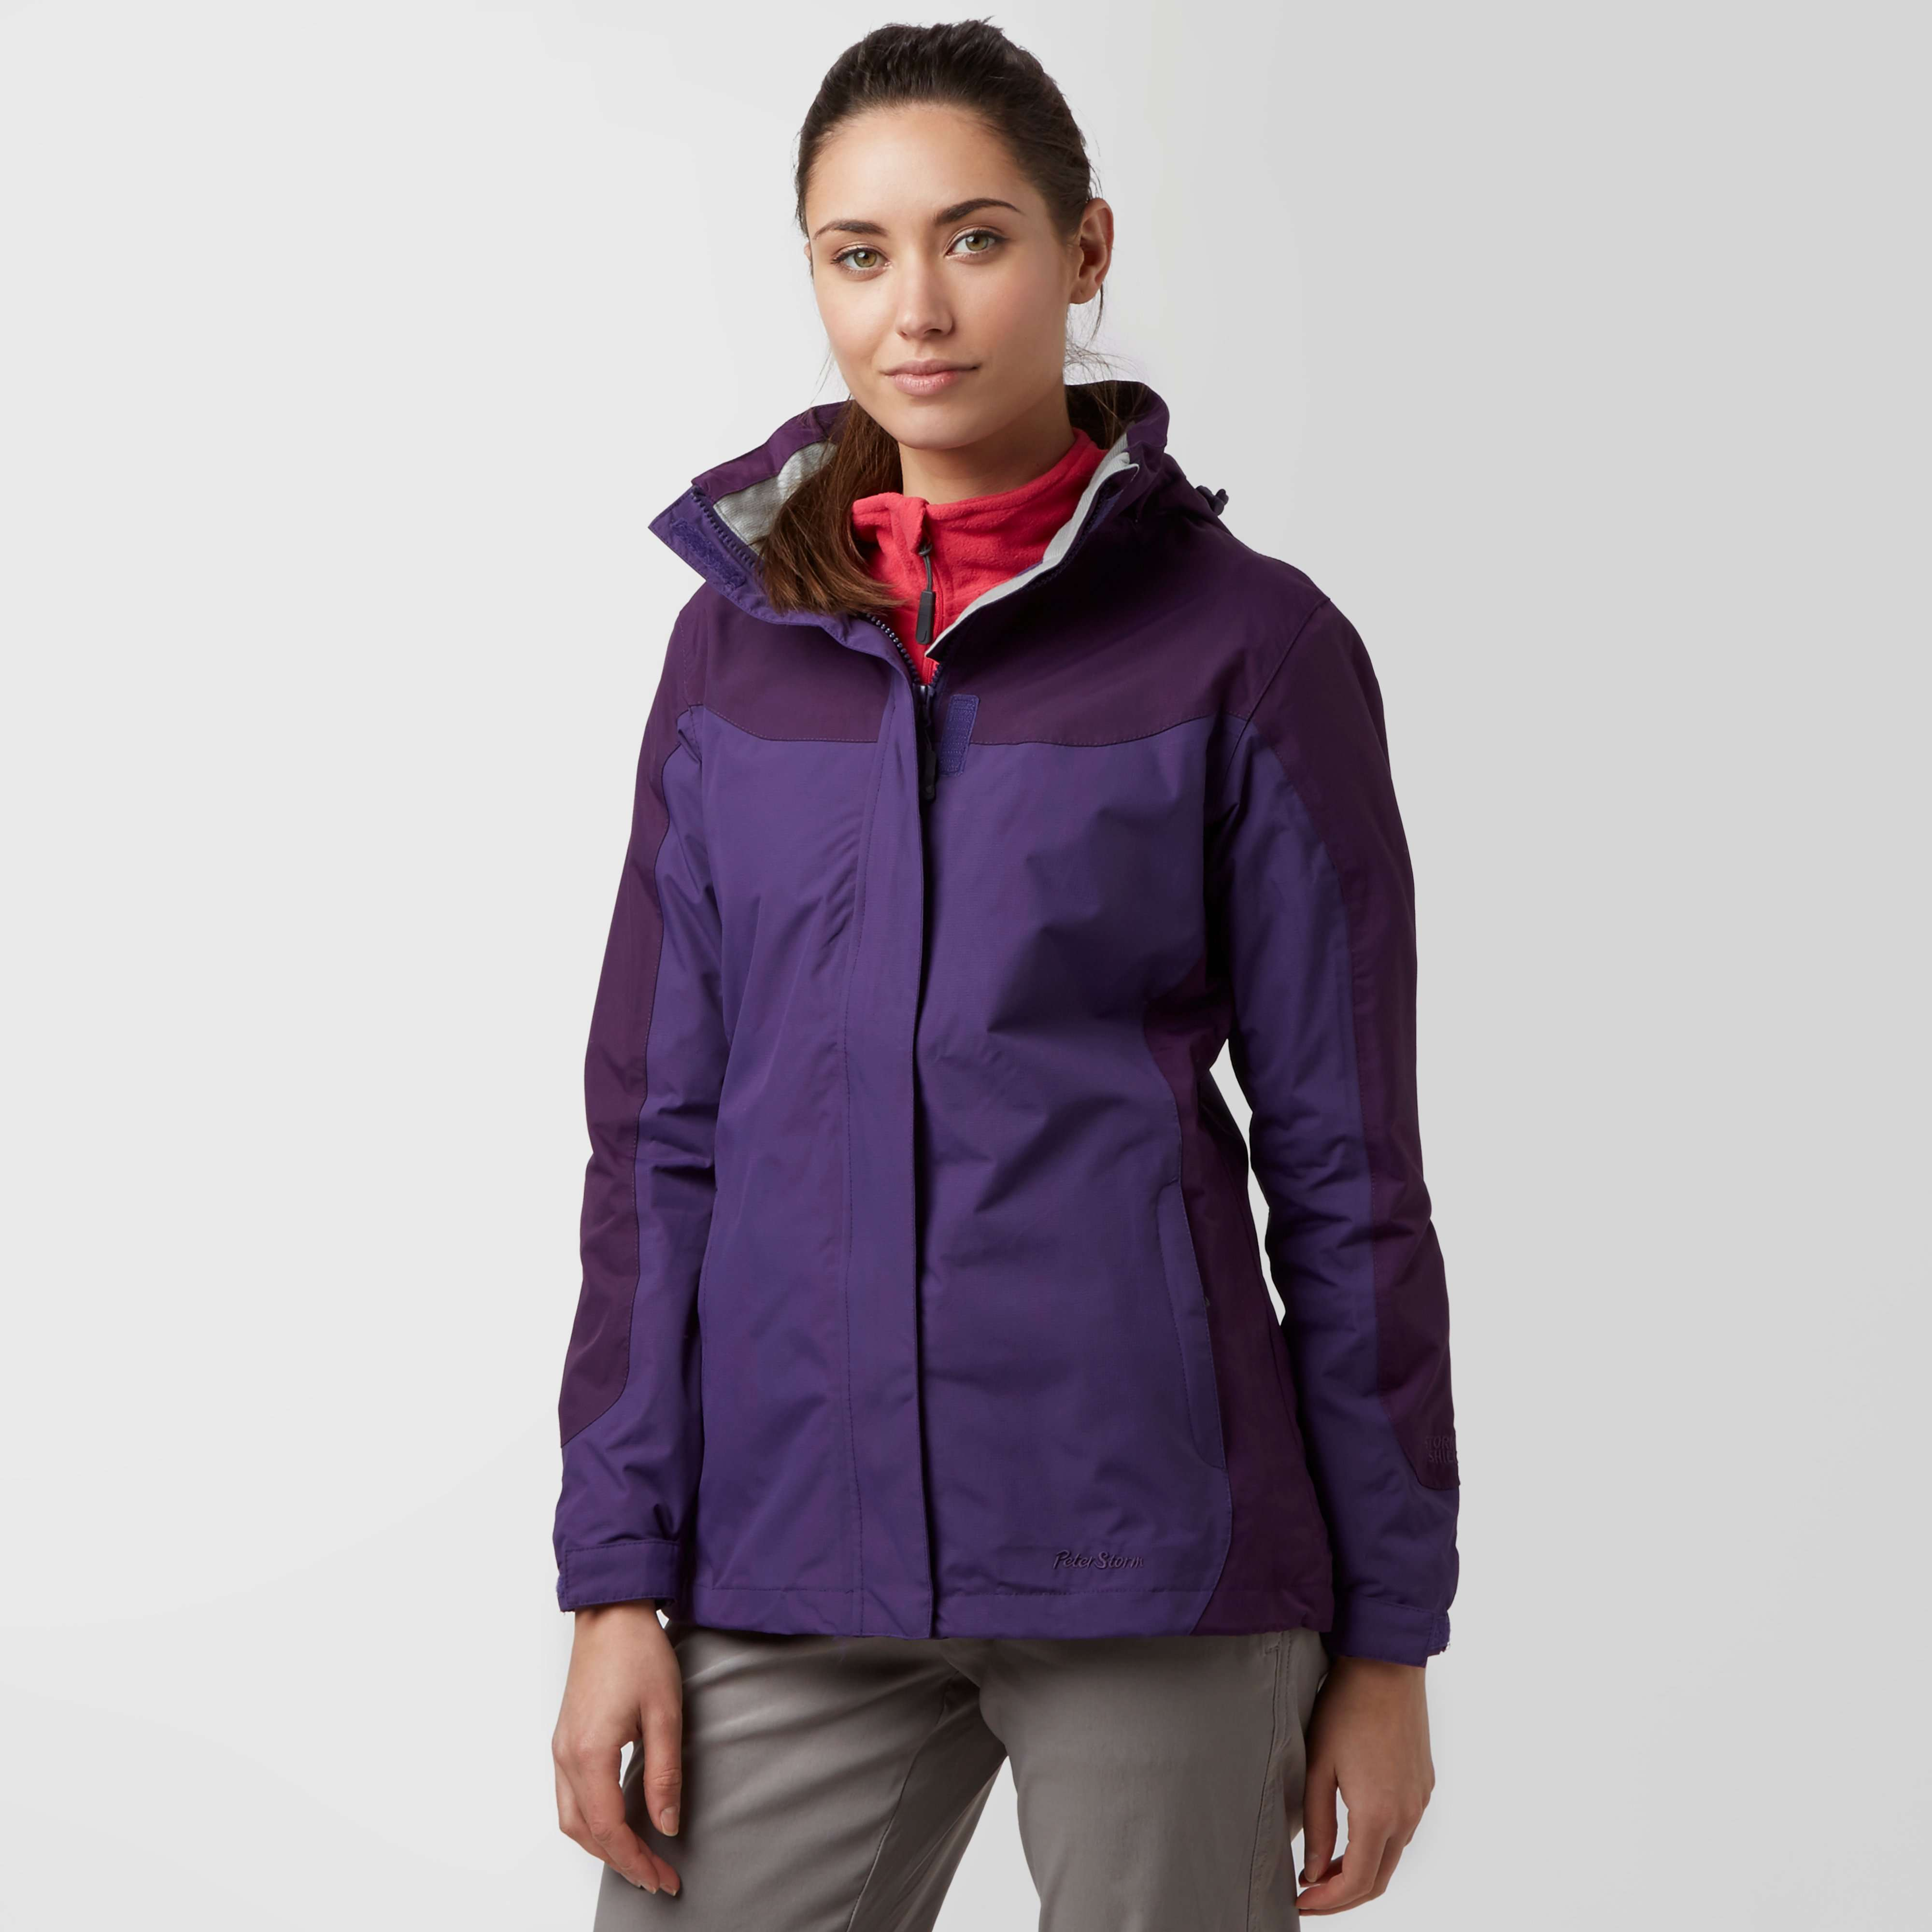 PETER STORM Women's Bowland Waterproof Jacket